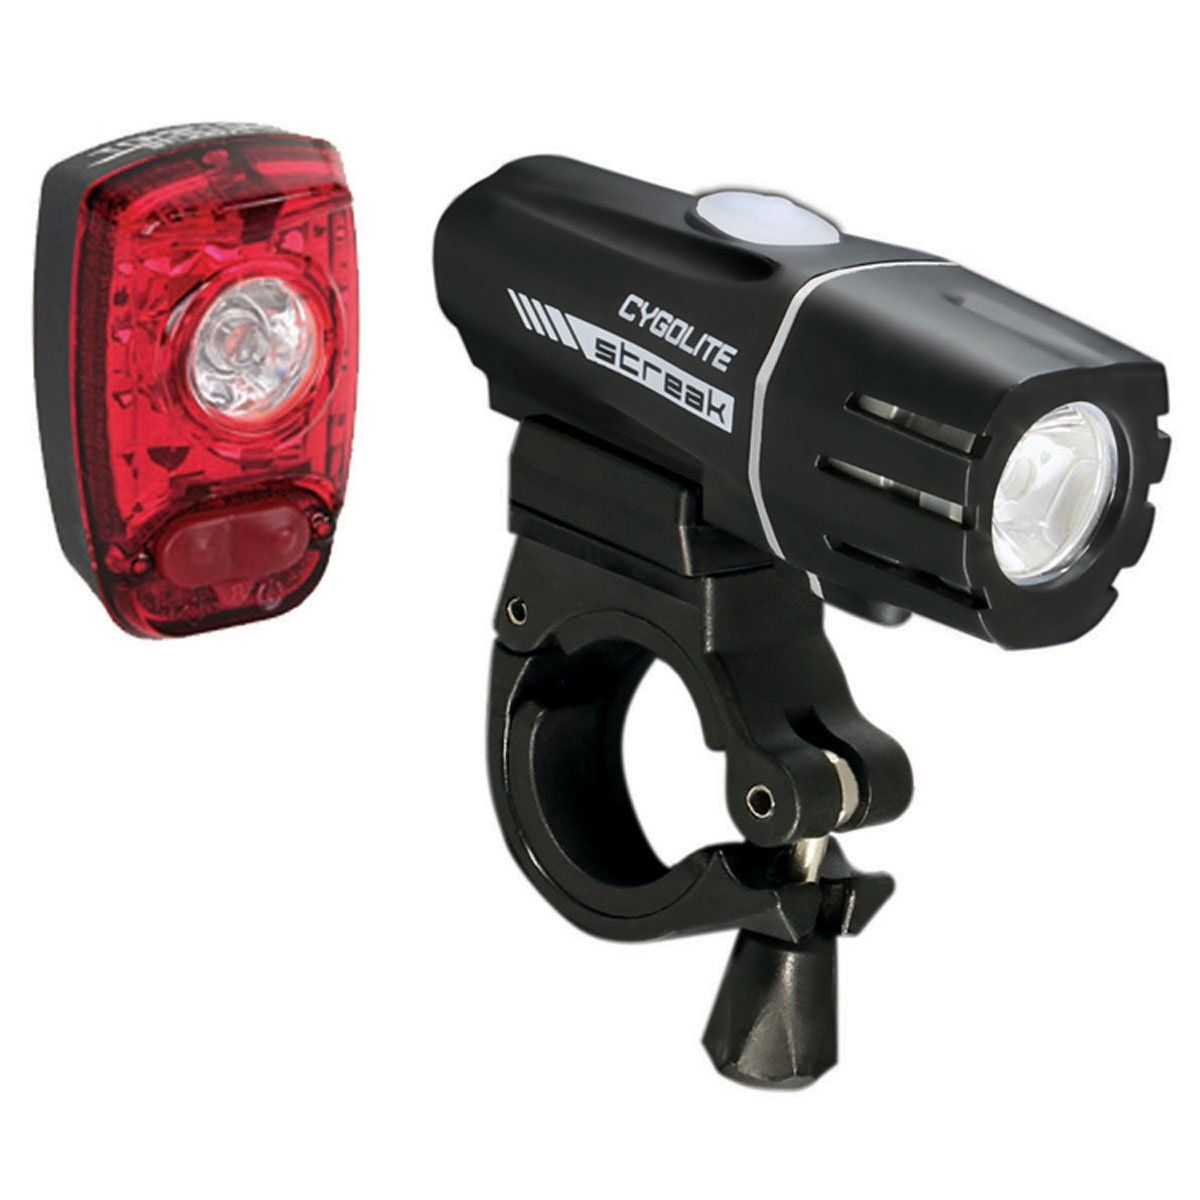 CYGOLITE Streak 310 Lumens Headlight Tail Light USB Bike Bicycle Black NEW!